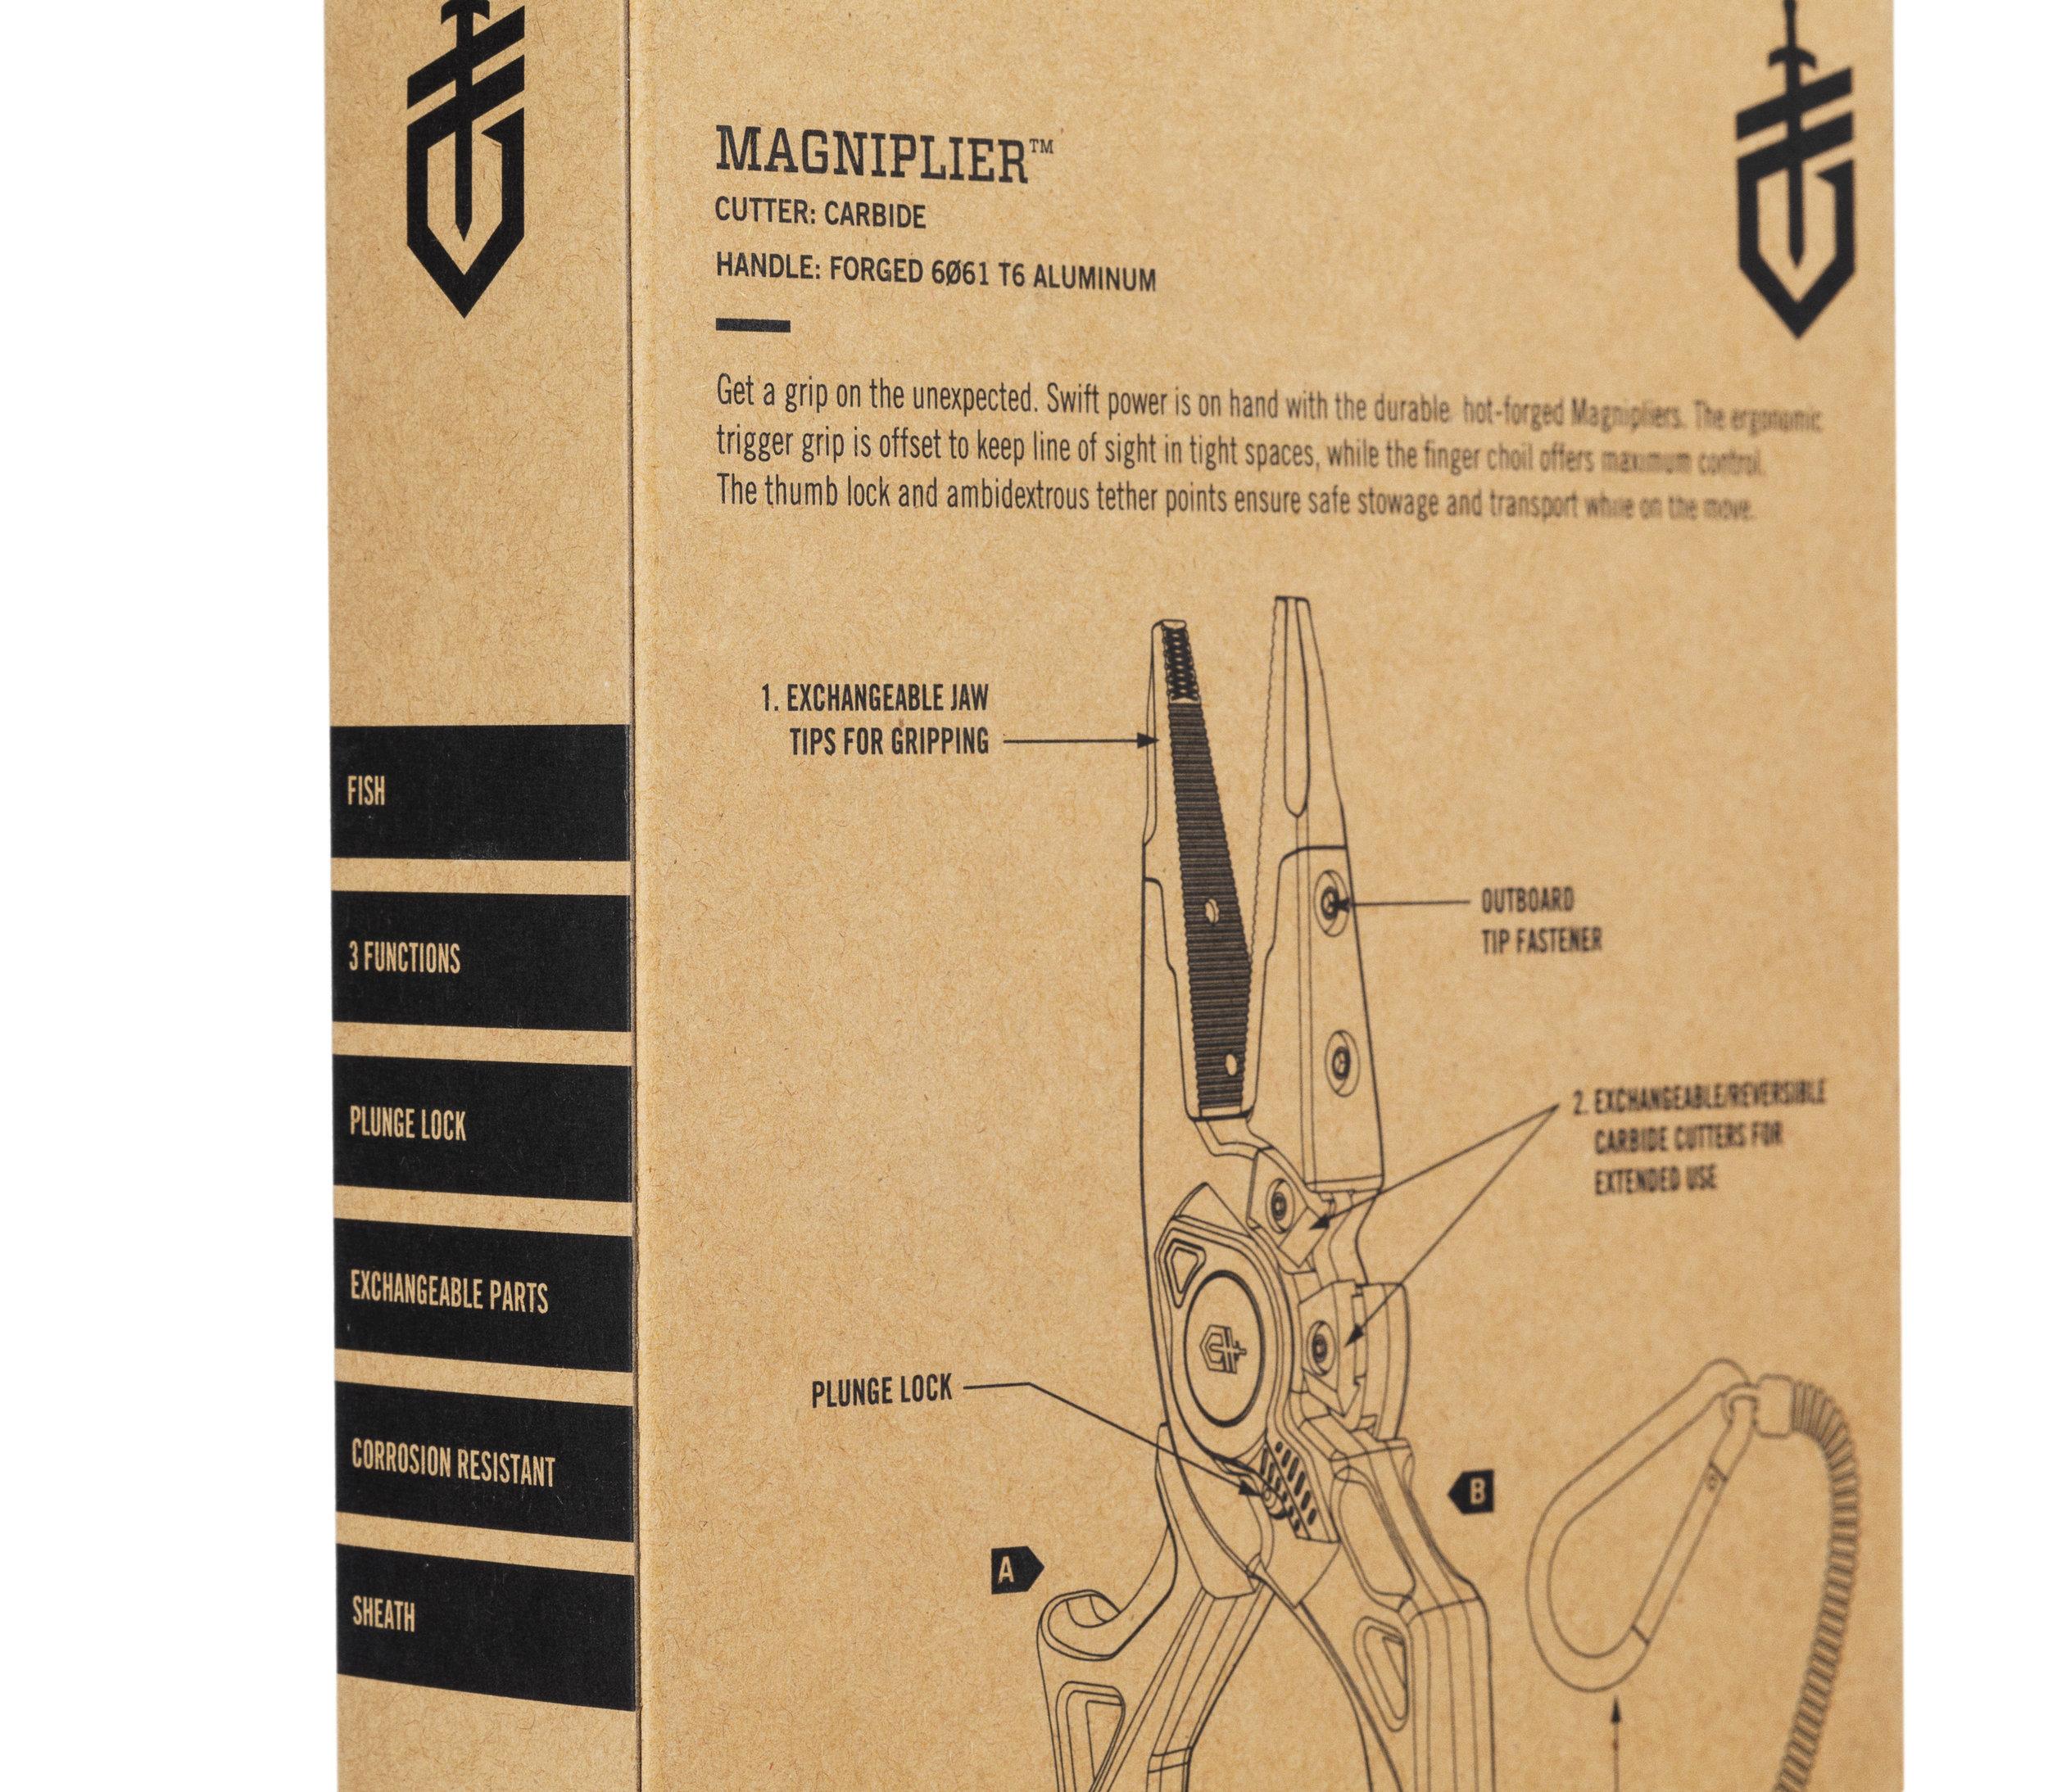 GG_Packaging_Magniplier_31-003137_H2.jpg